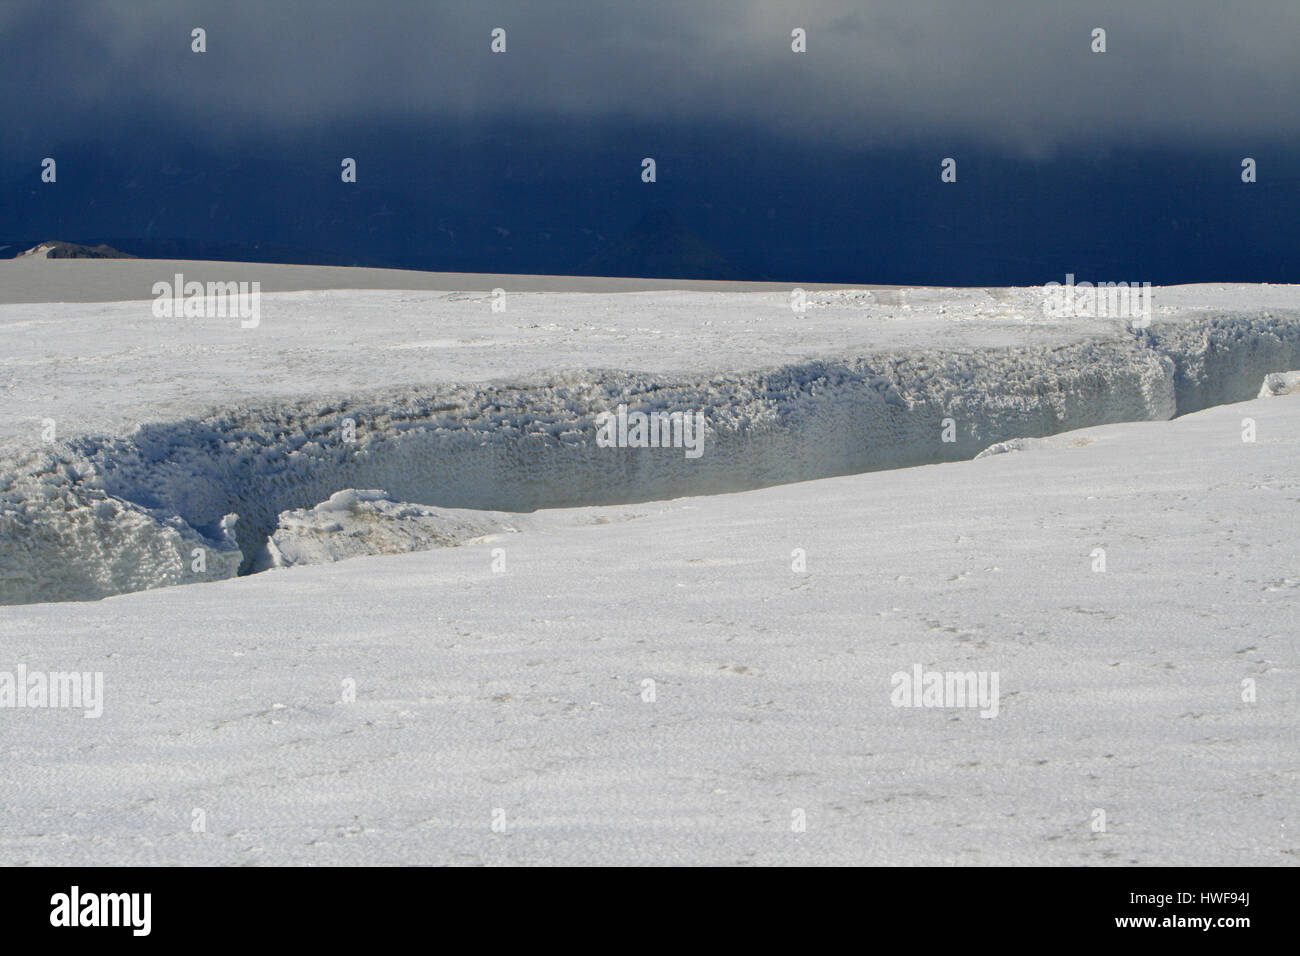 crevasse in Iceland - Stock Image